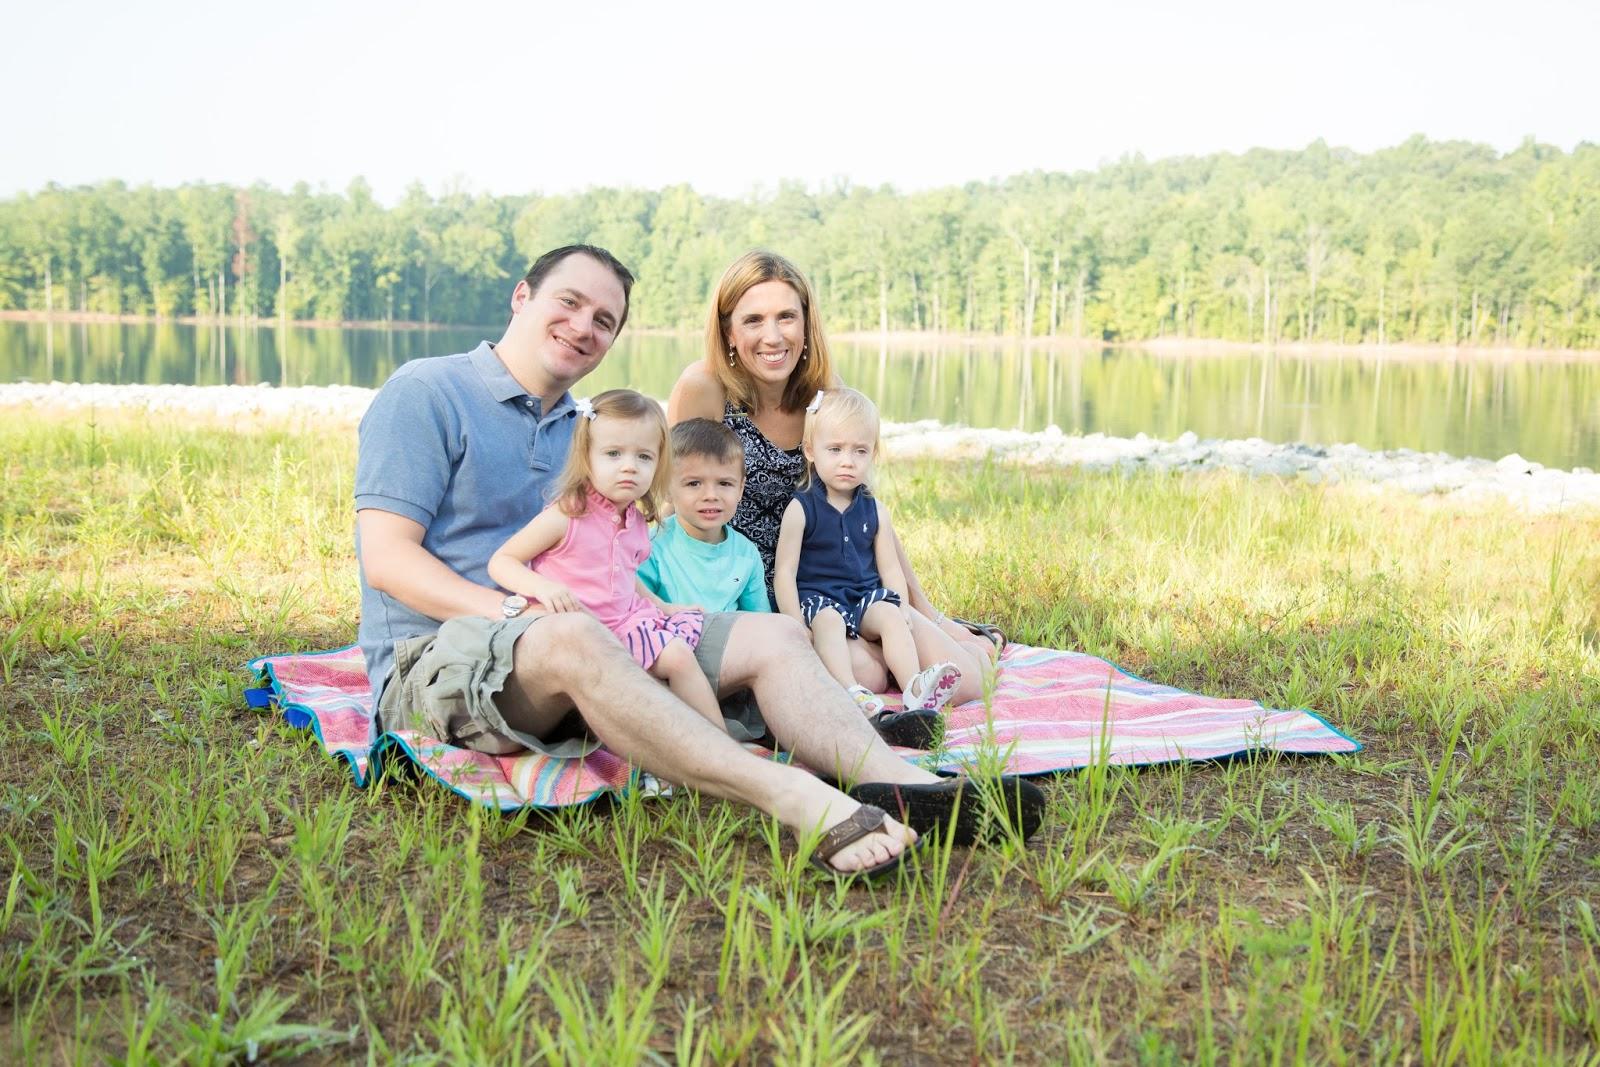 Hagge+Family+blog-3.jpg